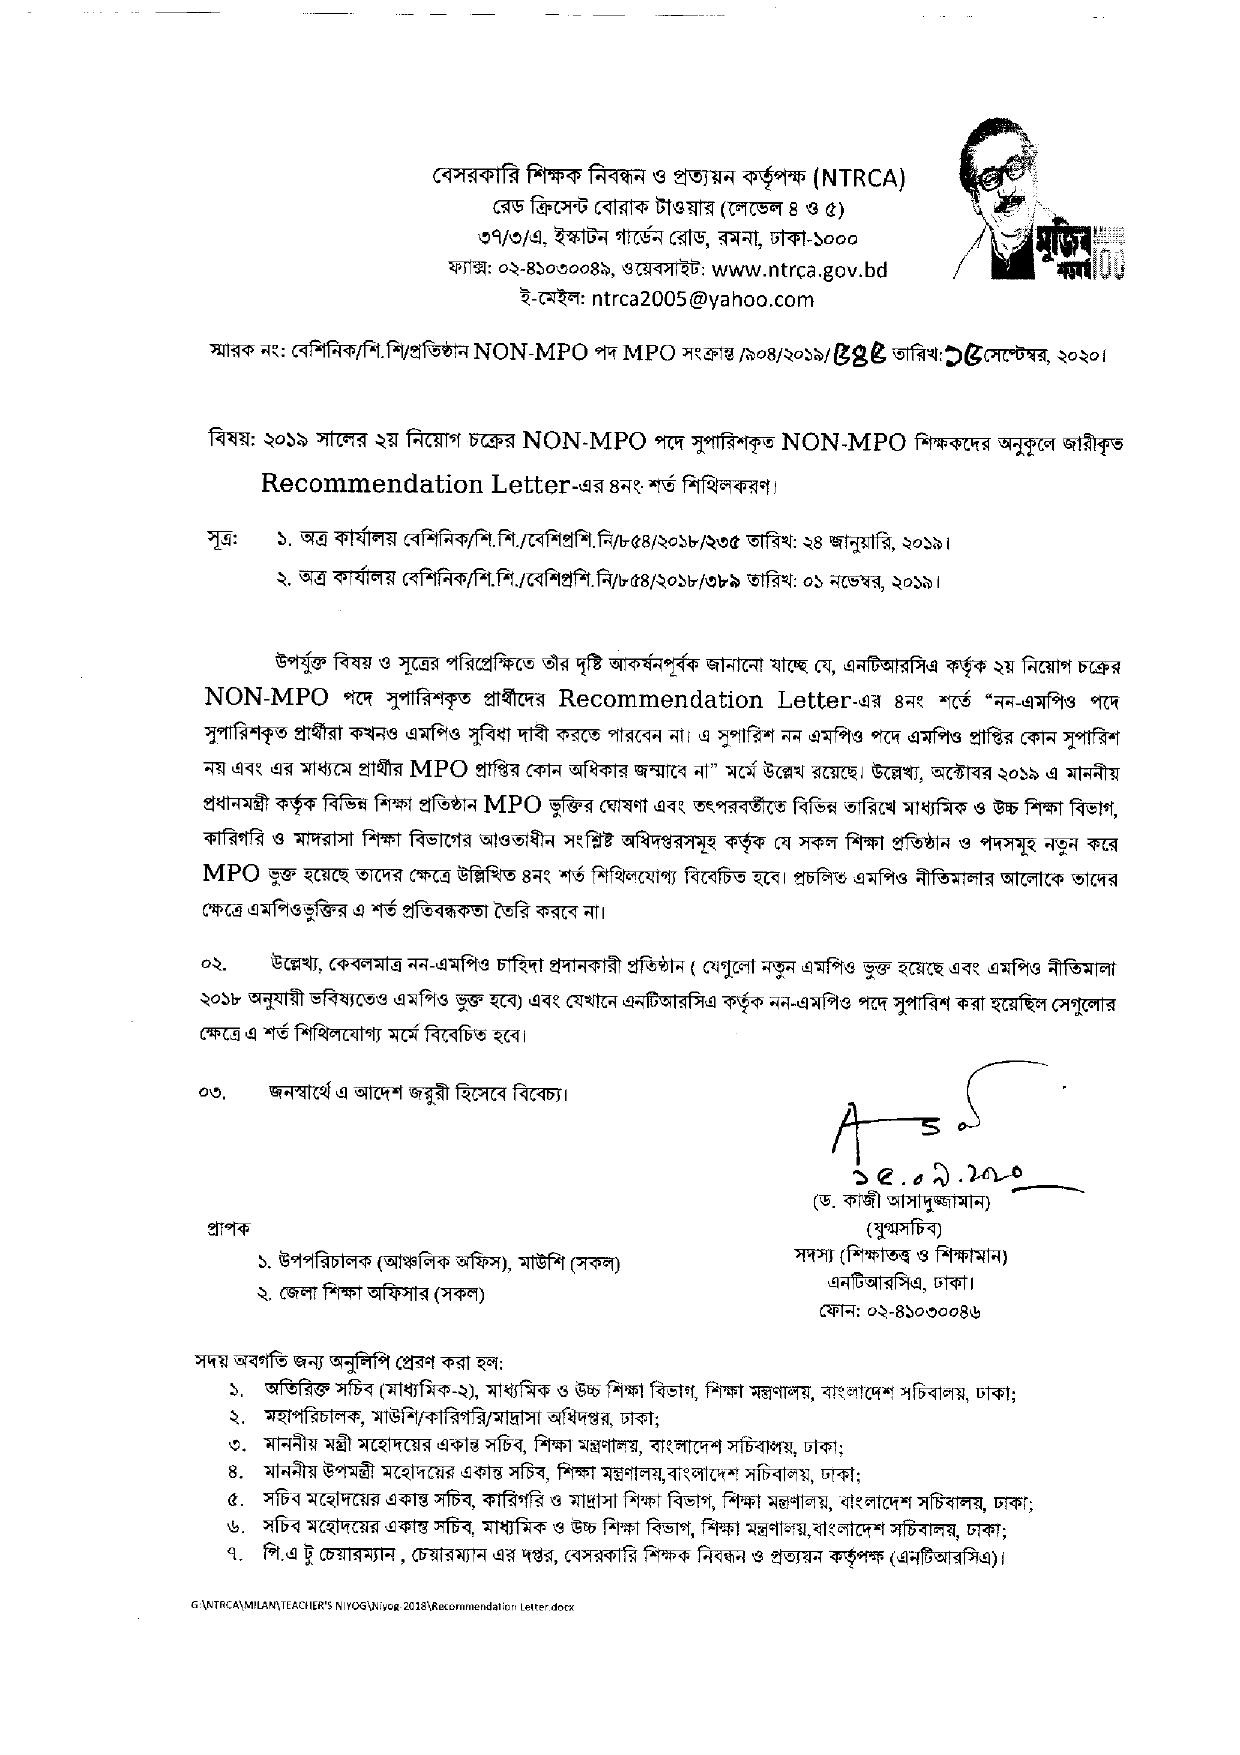 npo notice September 2020